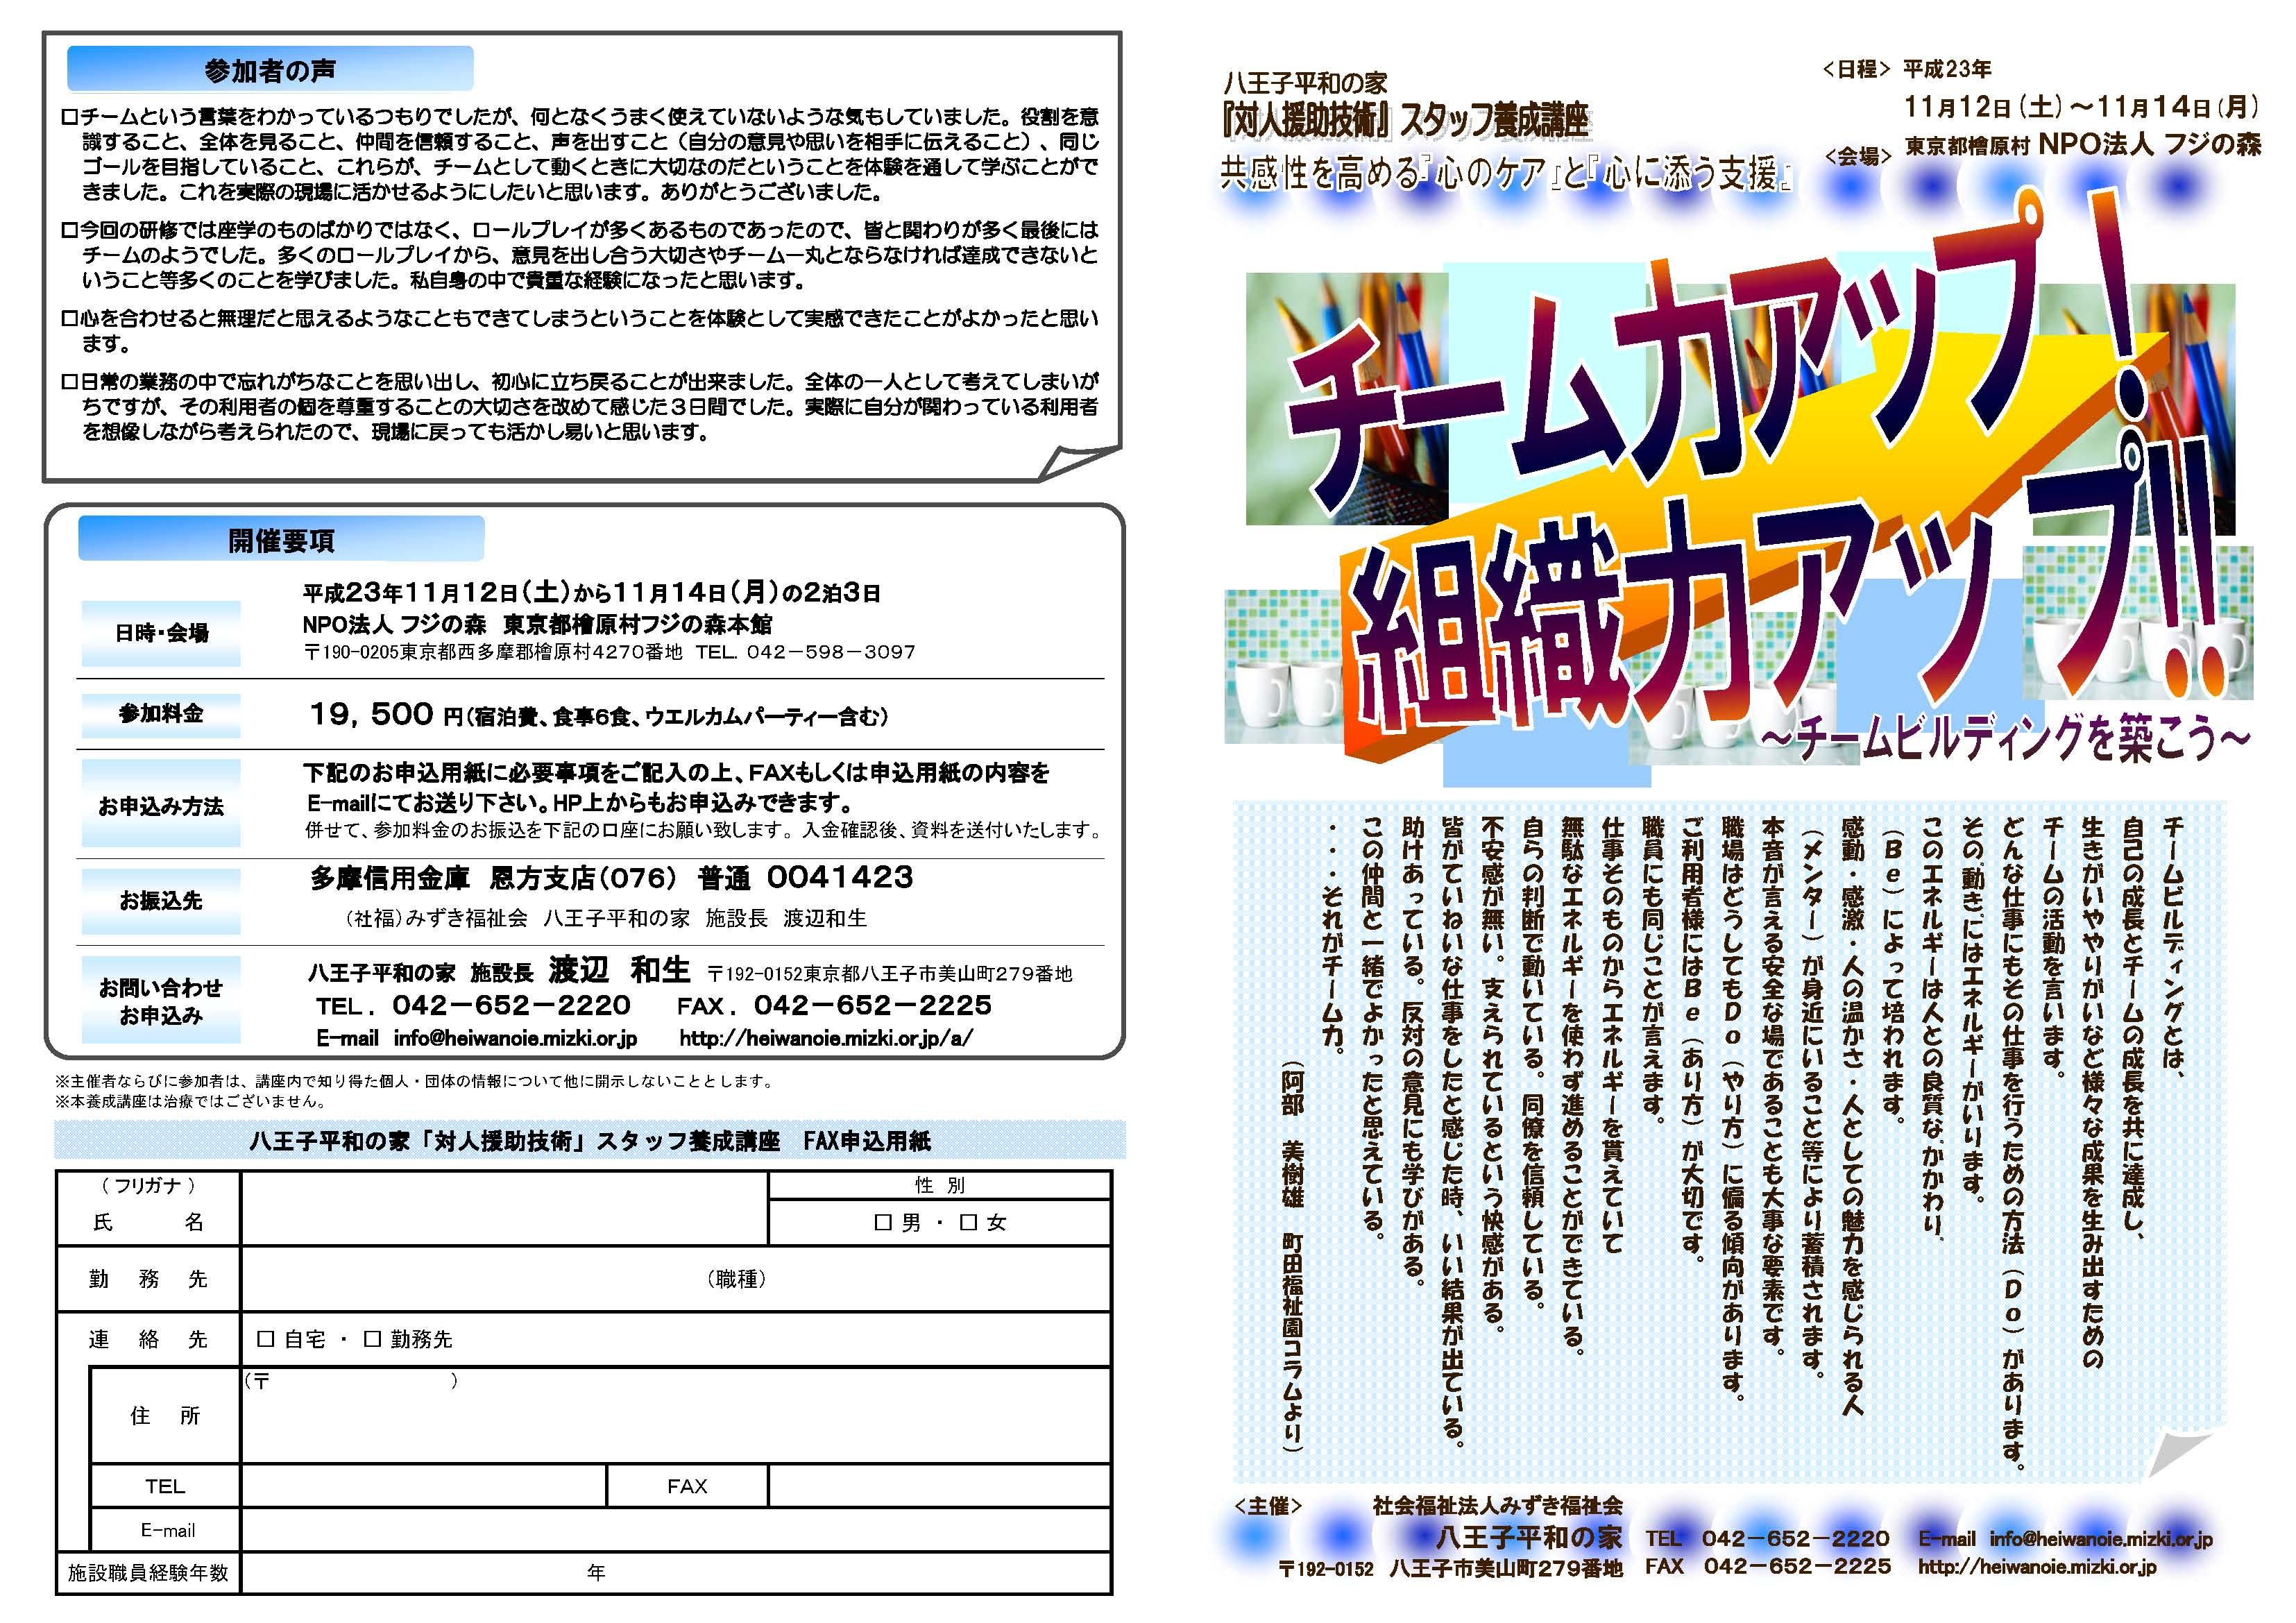 kokoro_2011_aki_1.jpg